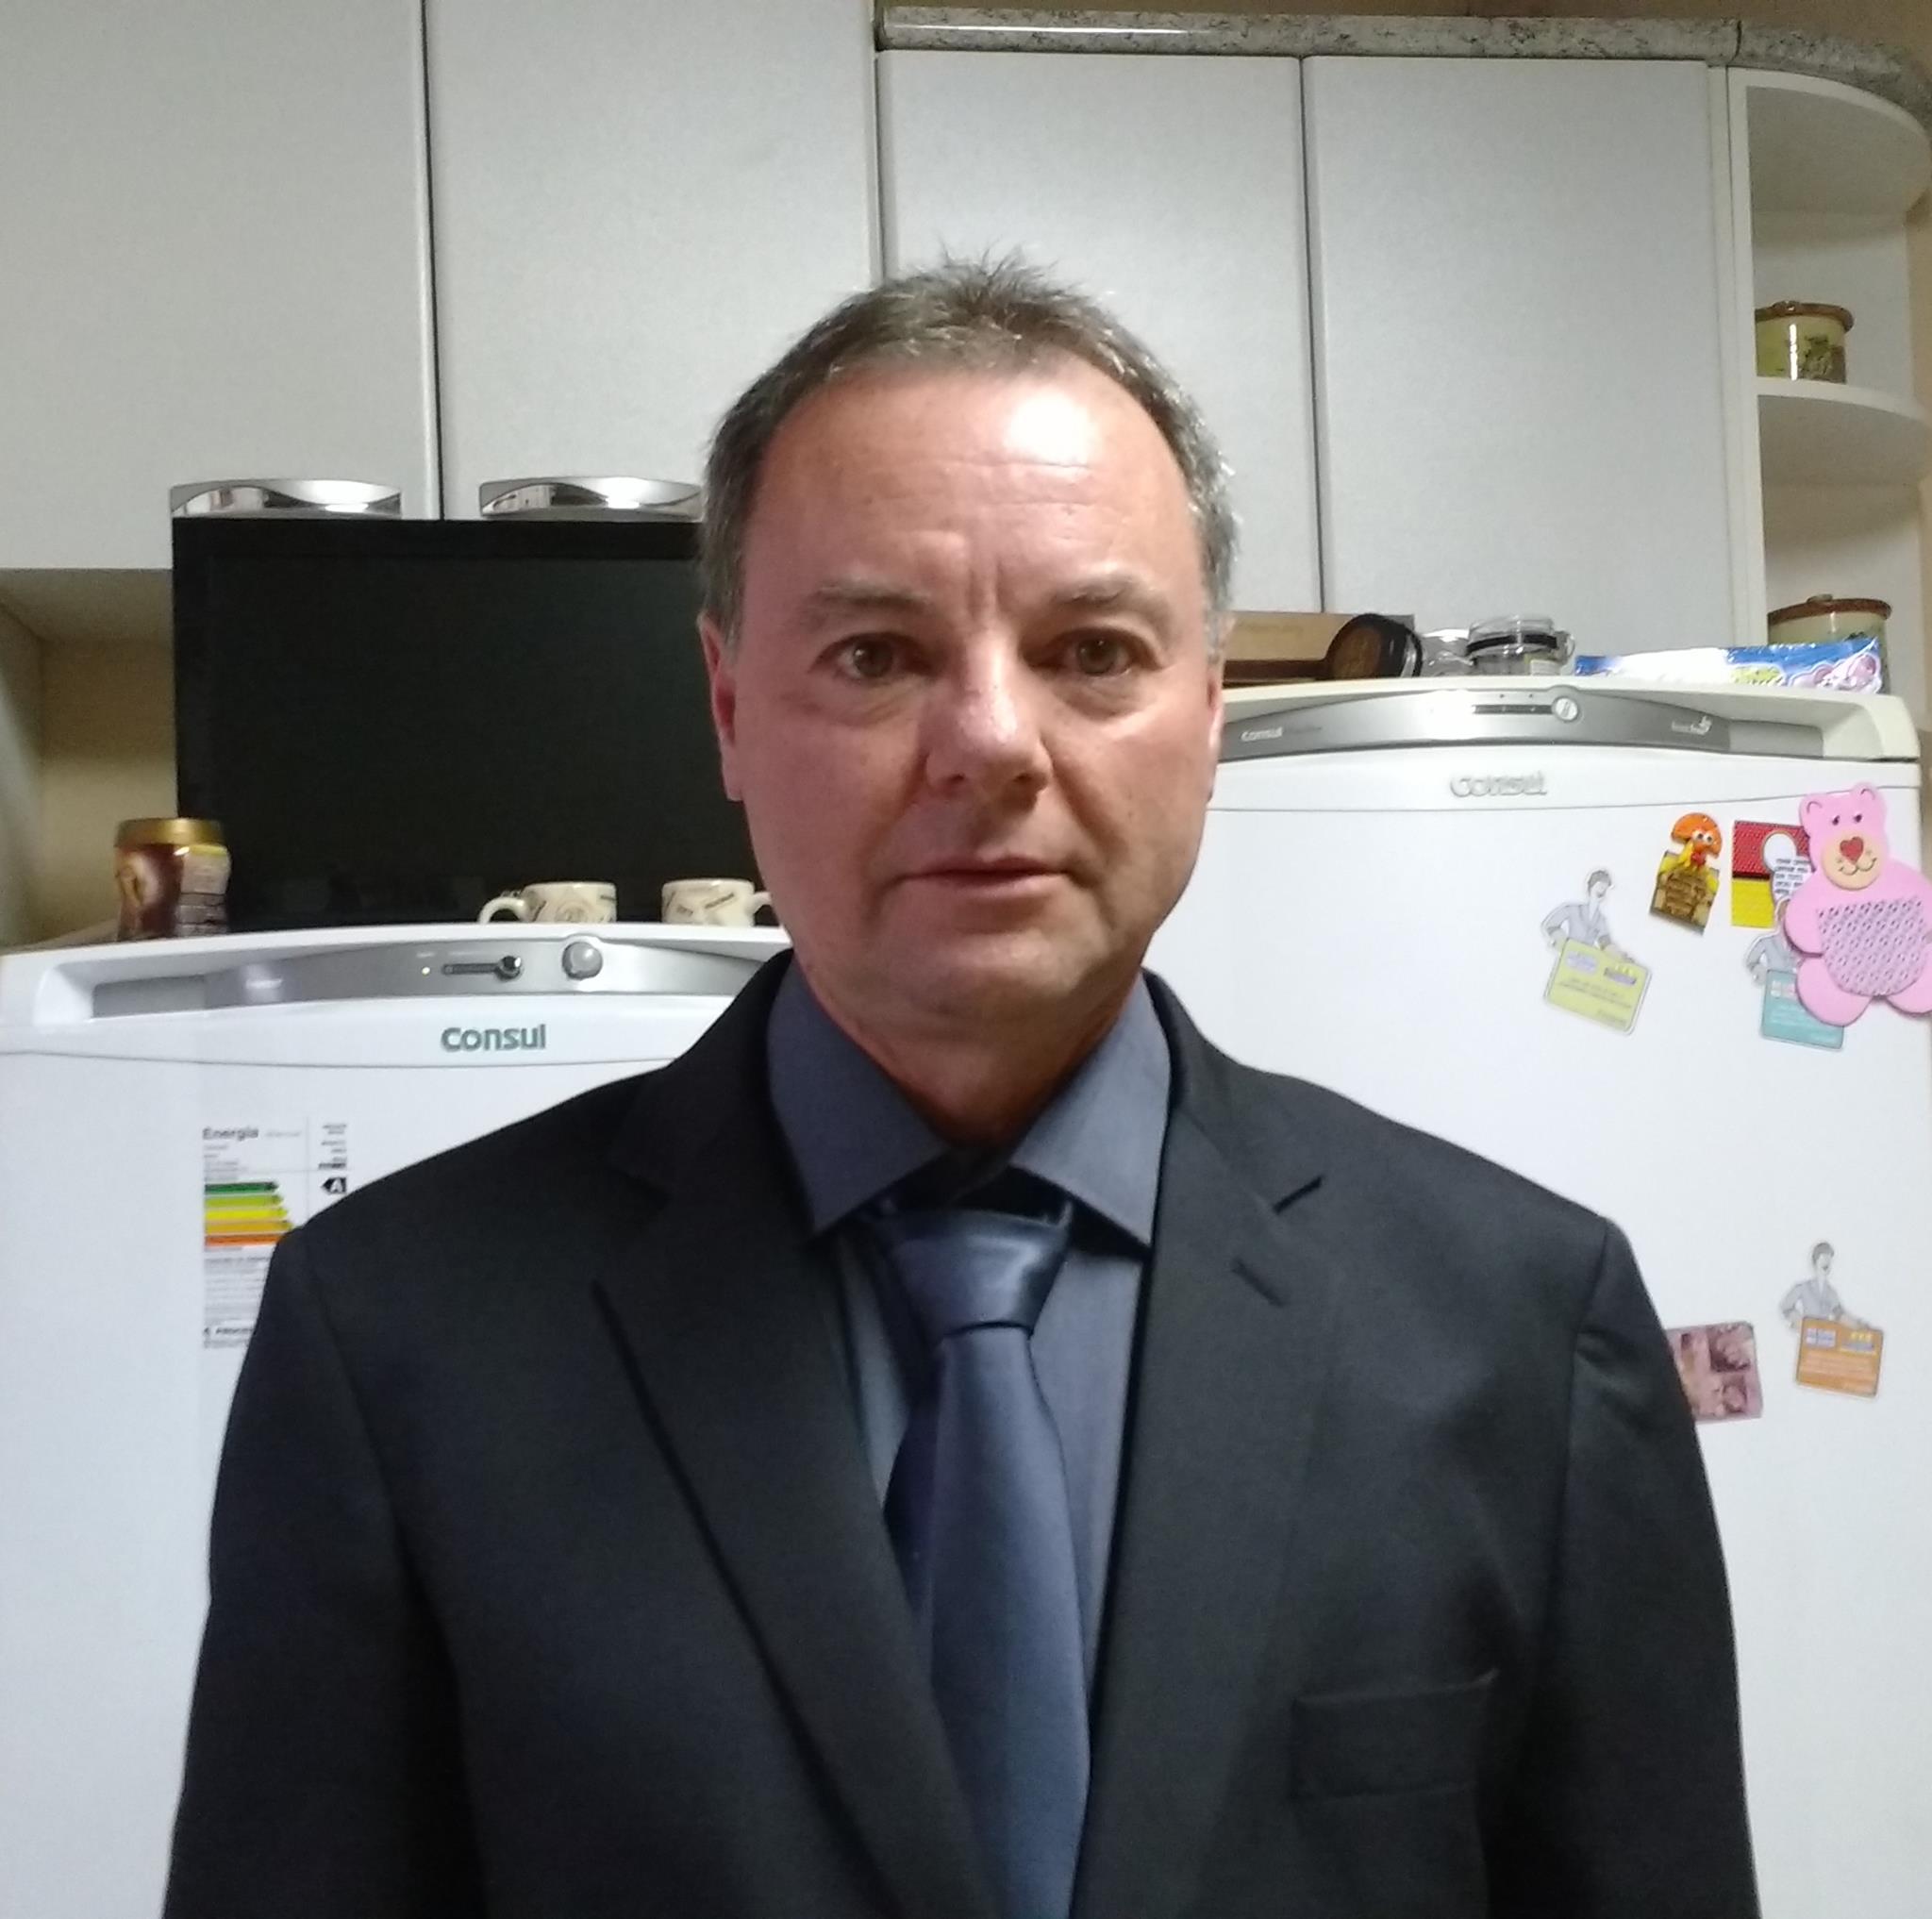 Amarildo Provensi fala sobre o recolhimento de embalagens vazias de agrotóxicos e o perigo do contrabando de veneno agrícola